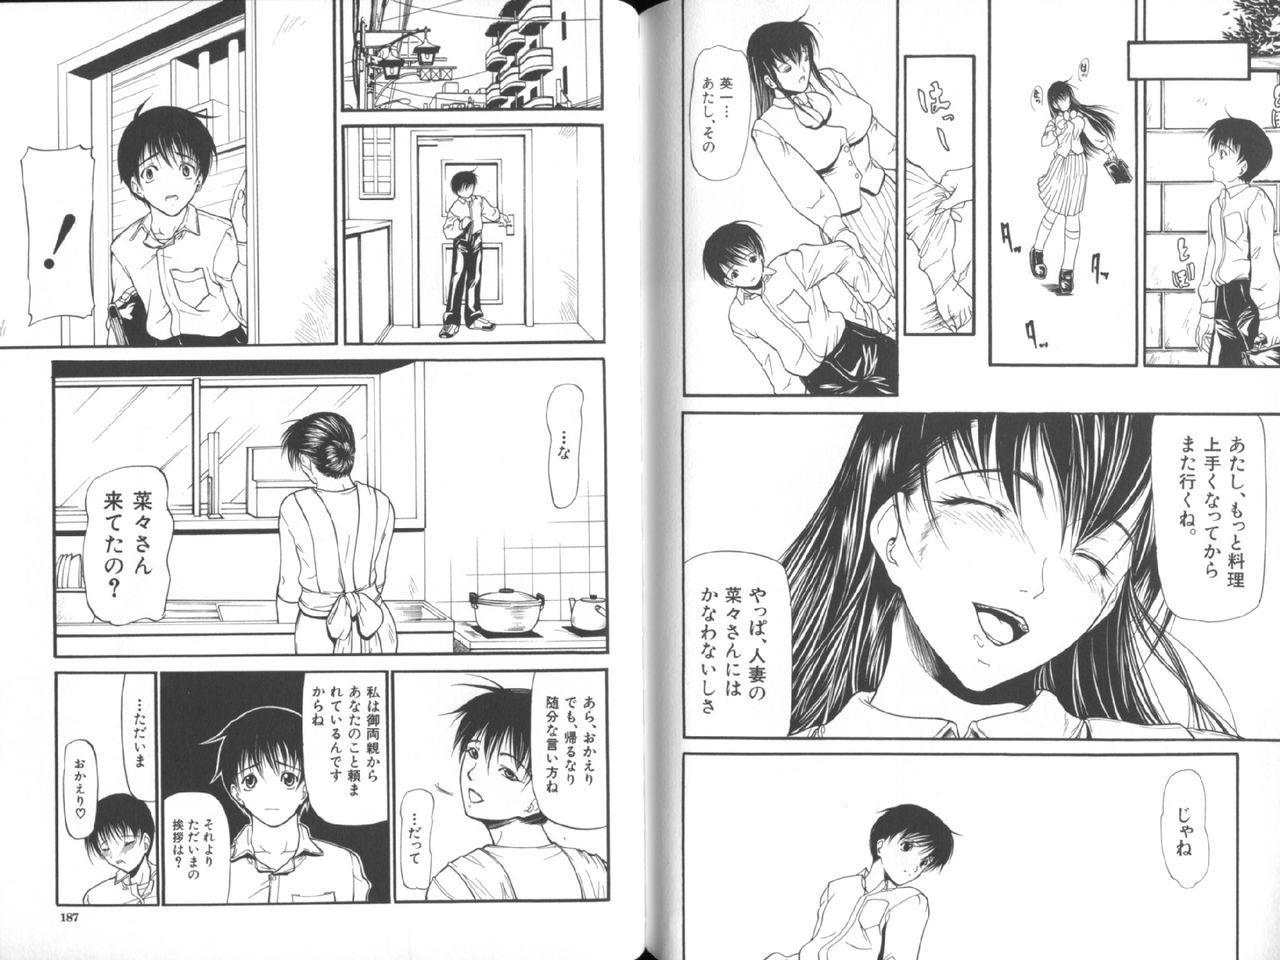 Senjou - A Desire is Instigated 94